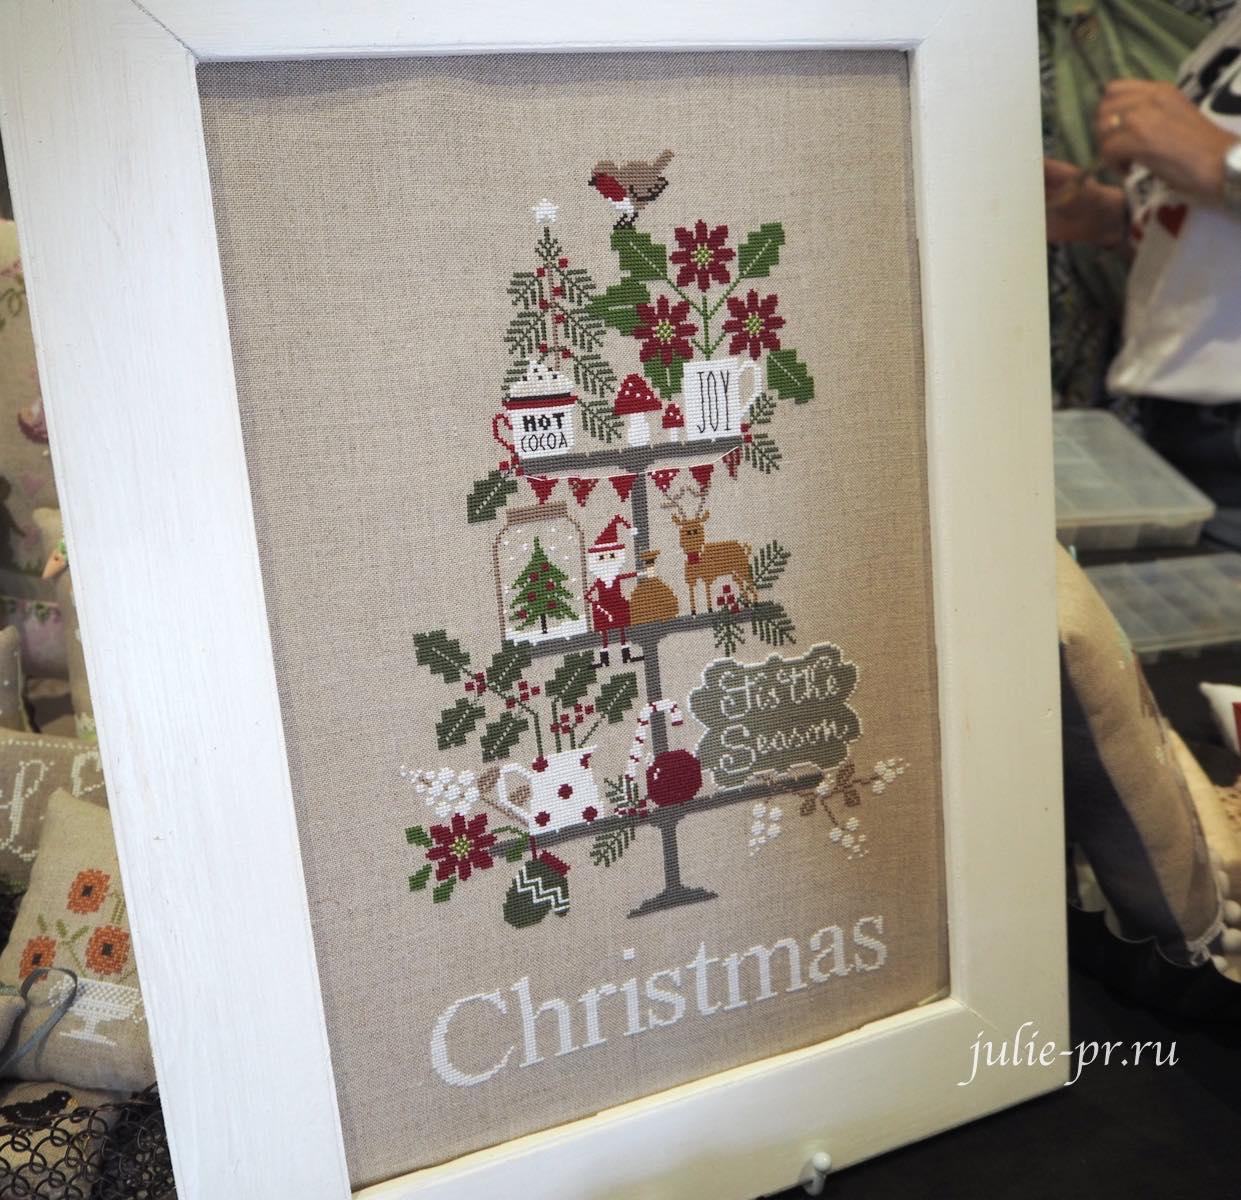 Madame Chantilly, Celebrate Christmas, вышивка крестом